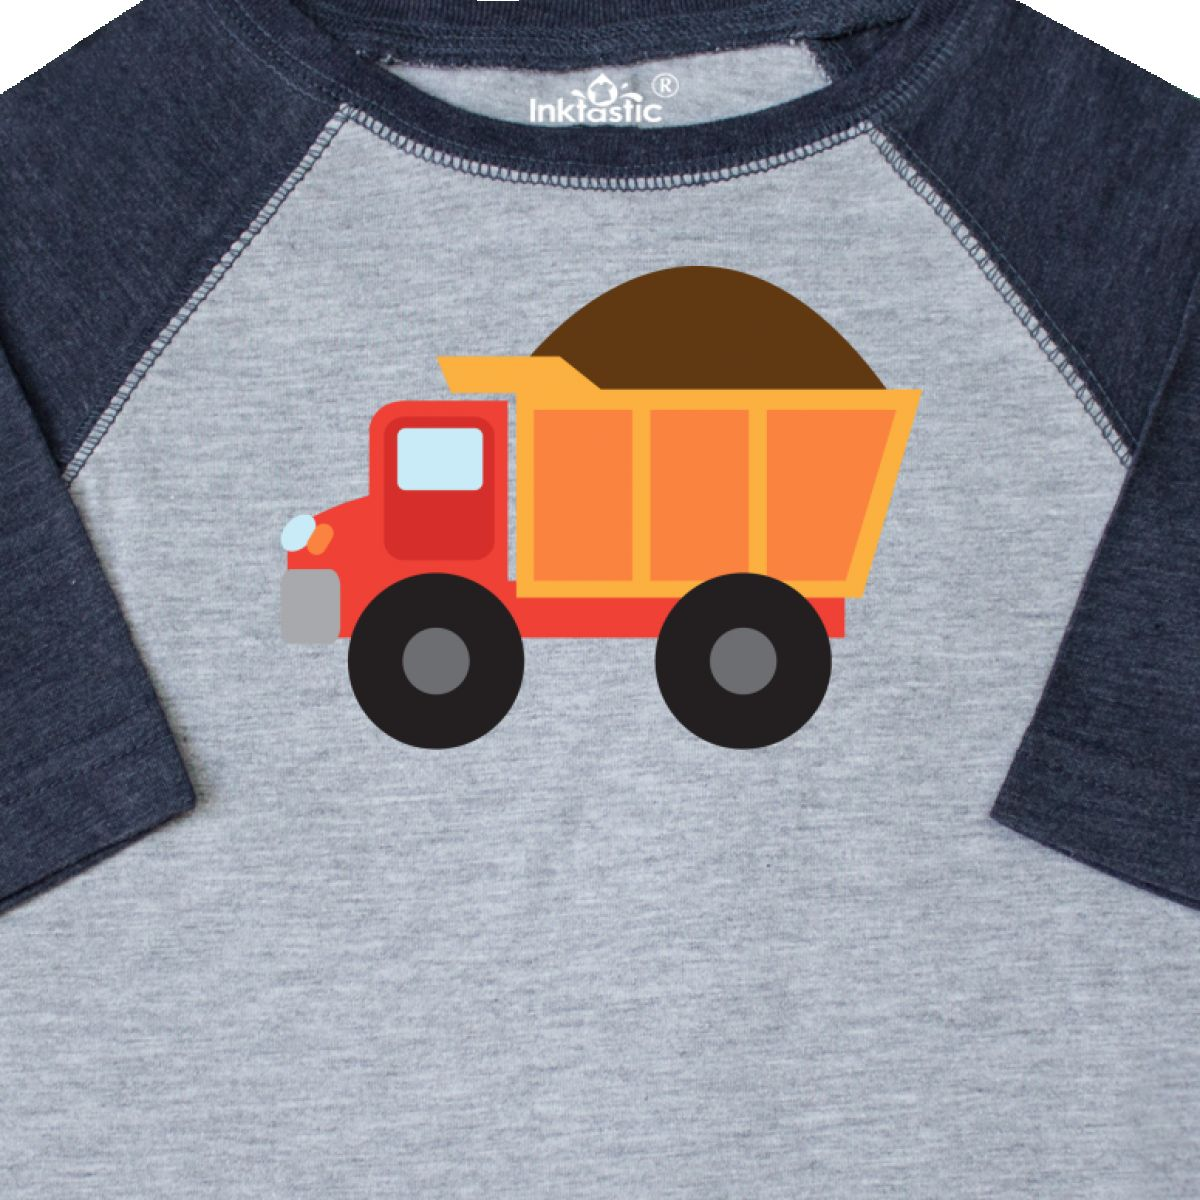 Inktastic-Work-Truck-Construction-Vehicle-Toddler-T-Shirt-Trucks-Vehicles-Cute thumbnail 8